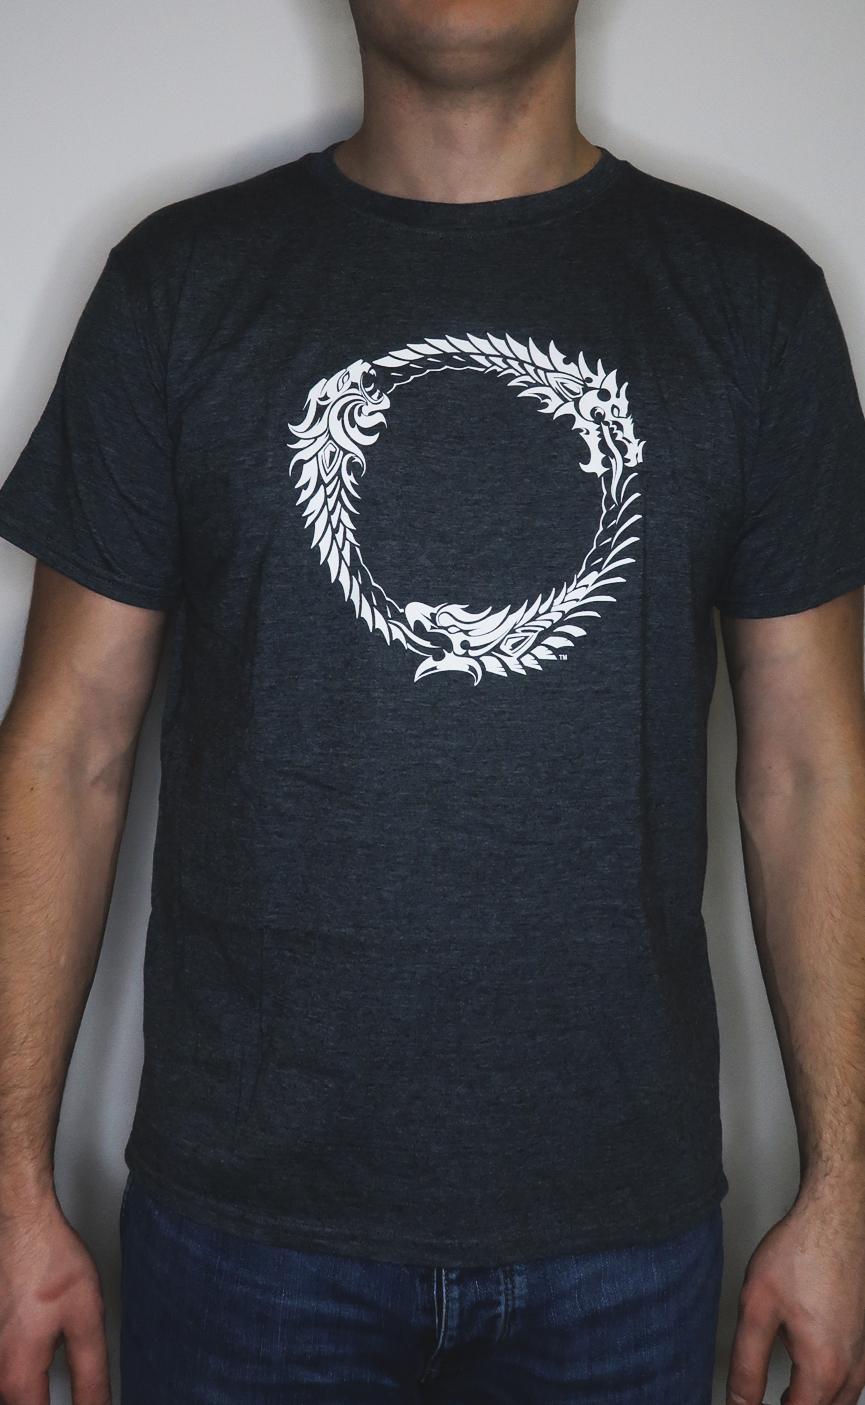 Koszulka The Elder Scrolls Online - rozmiar XL